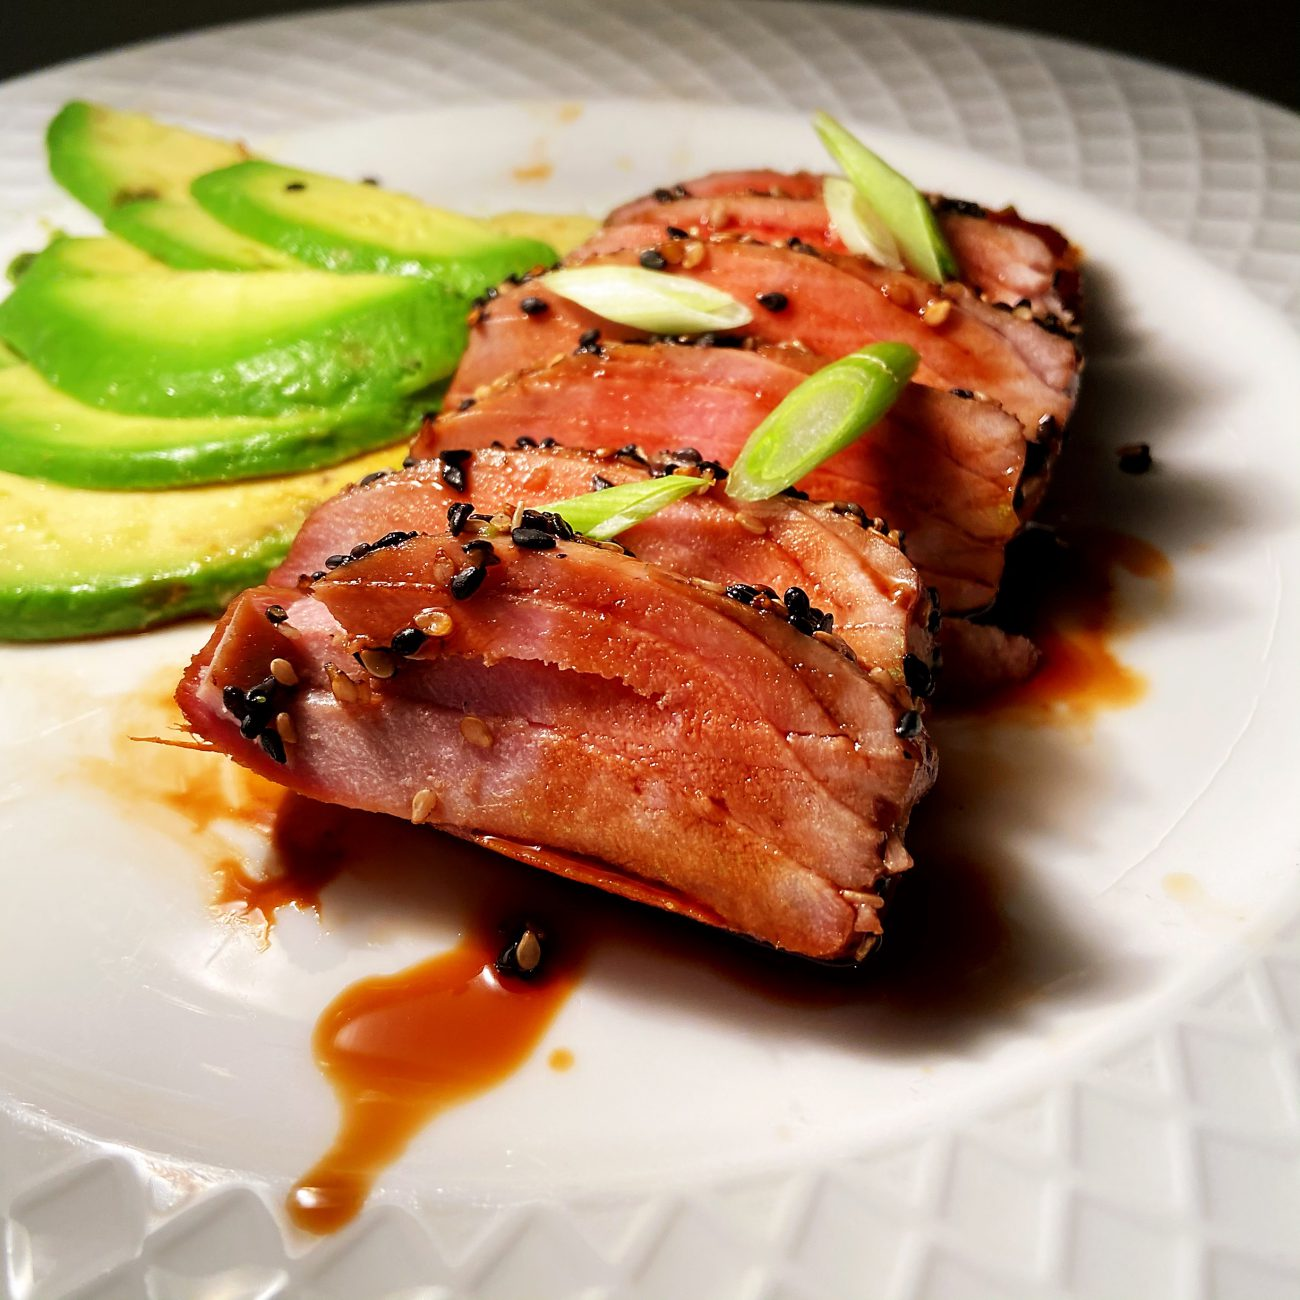 Teriyaki Tuna Steak with Avocado